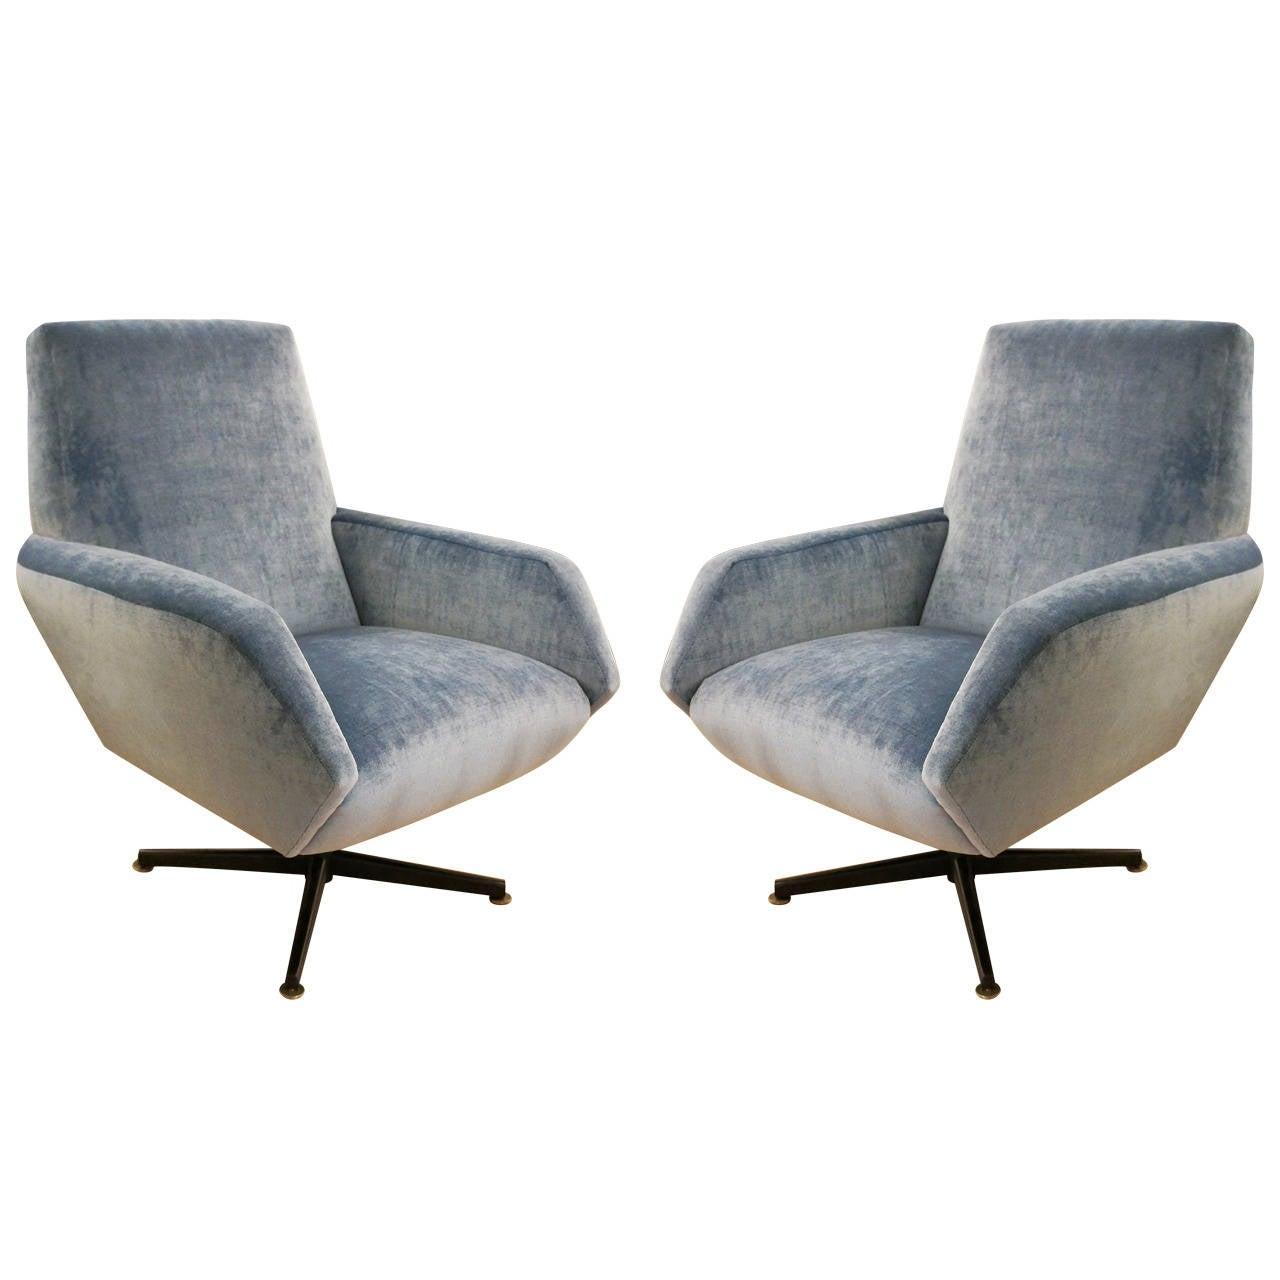 Italian mid century swivel lounge chairs at 1stdibs